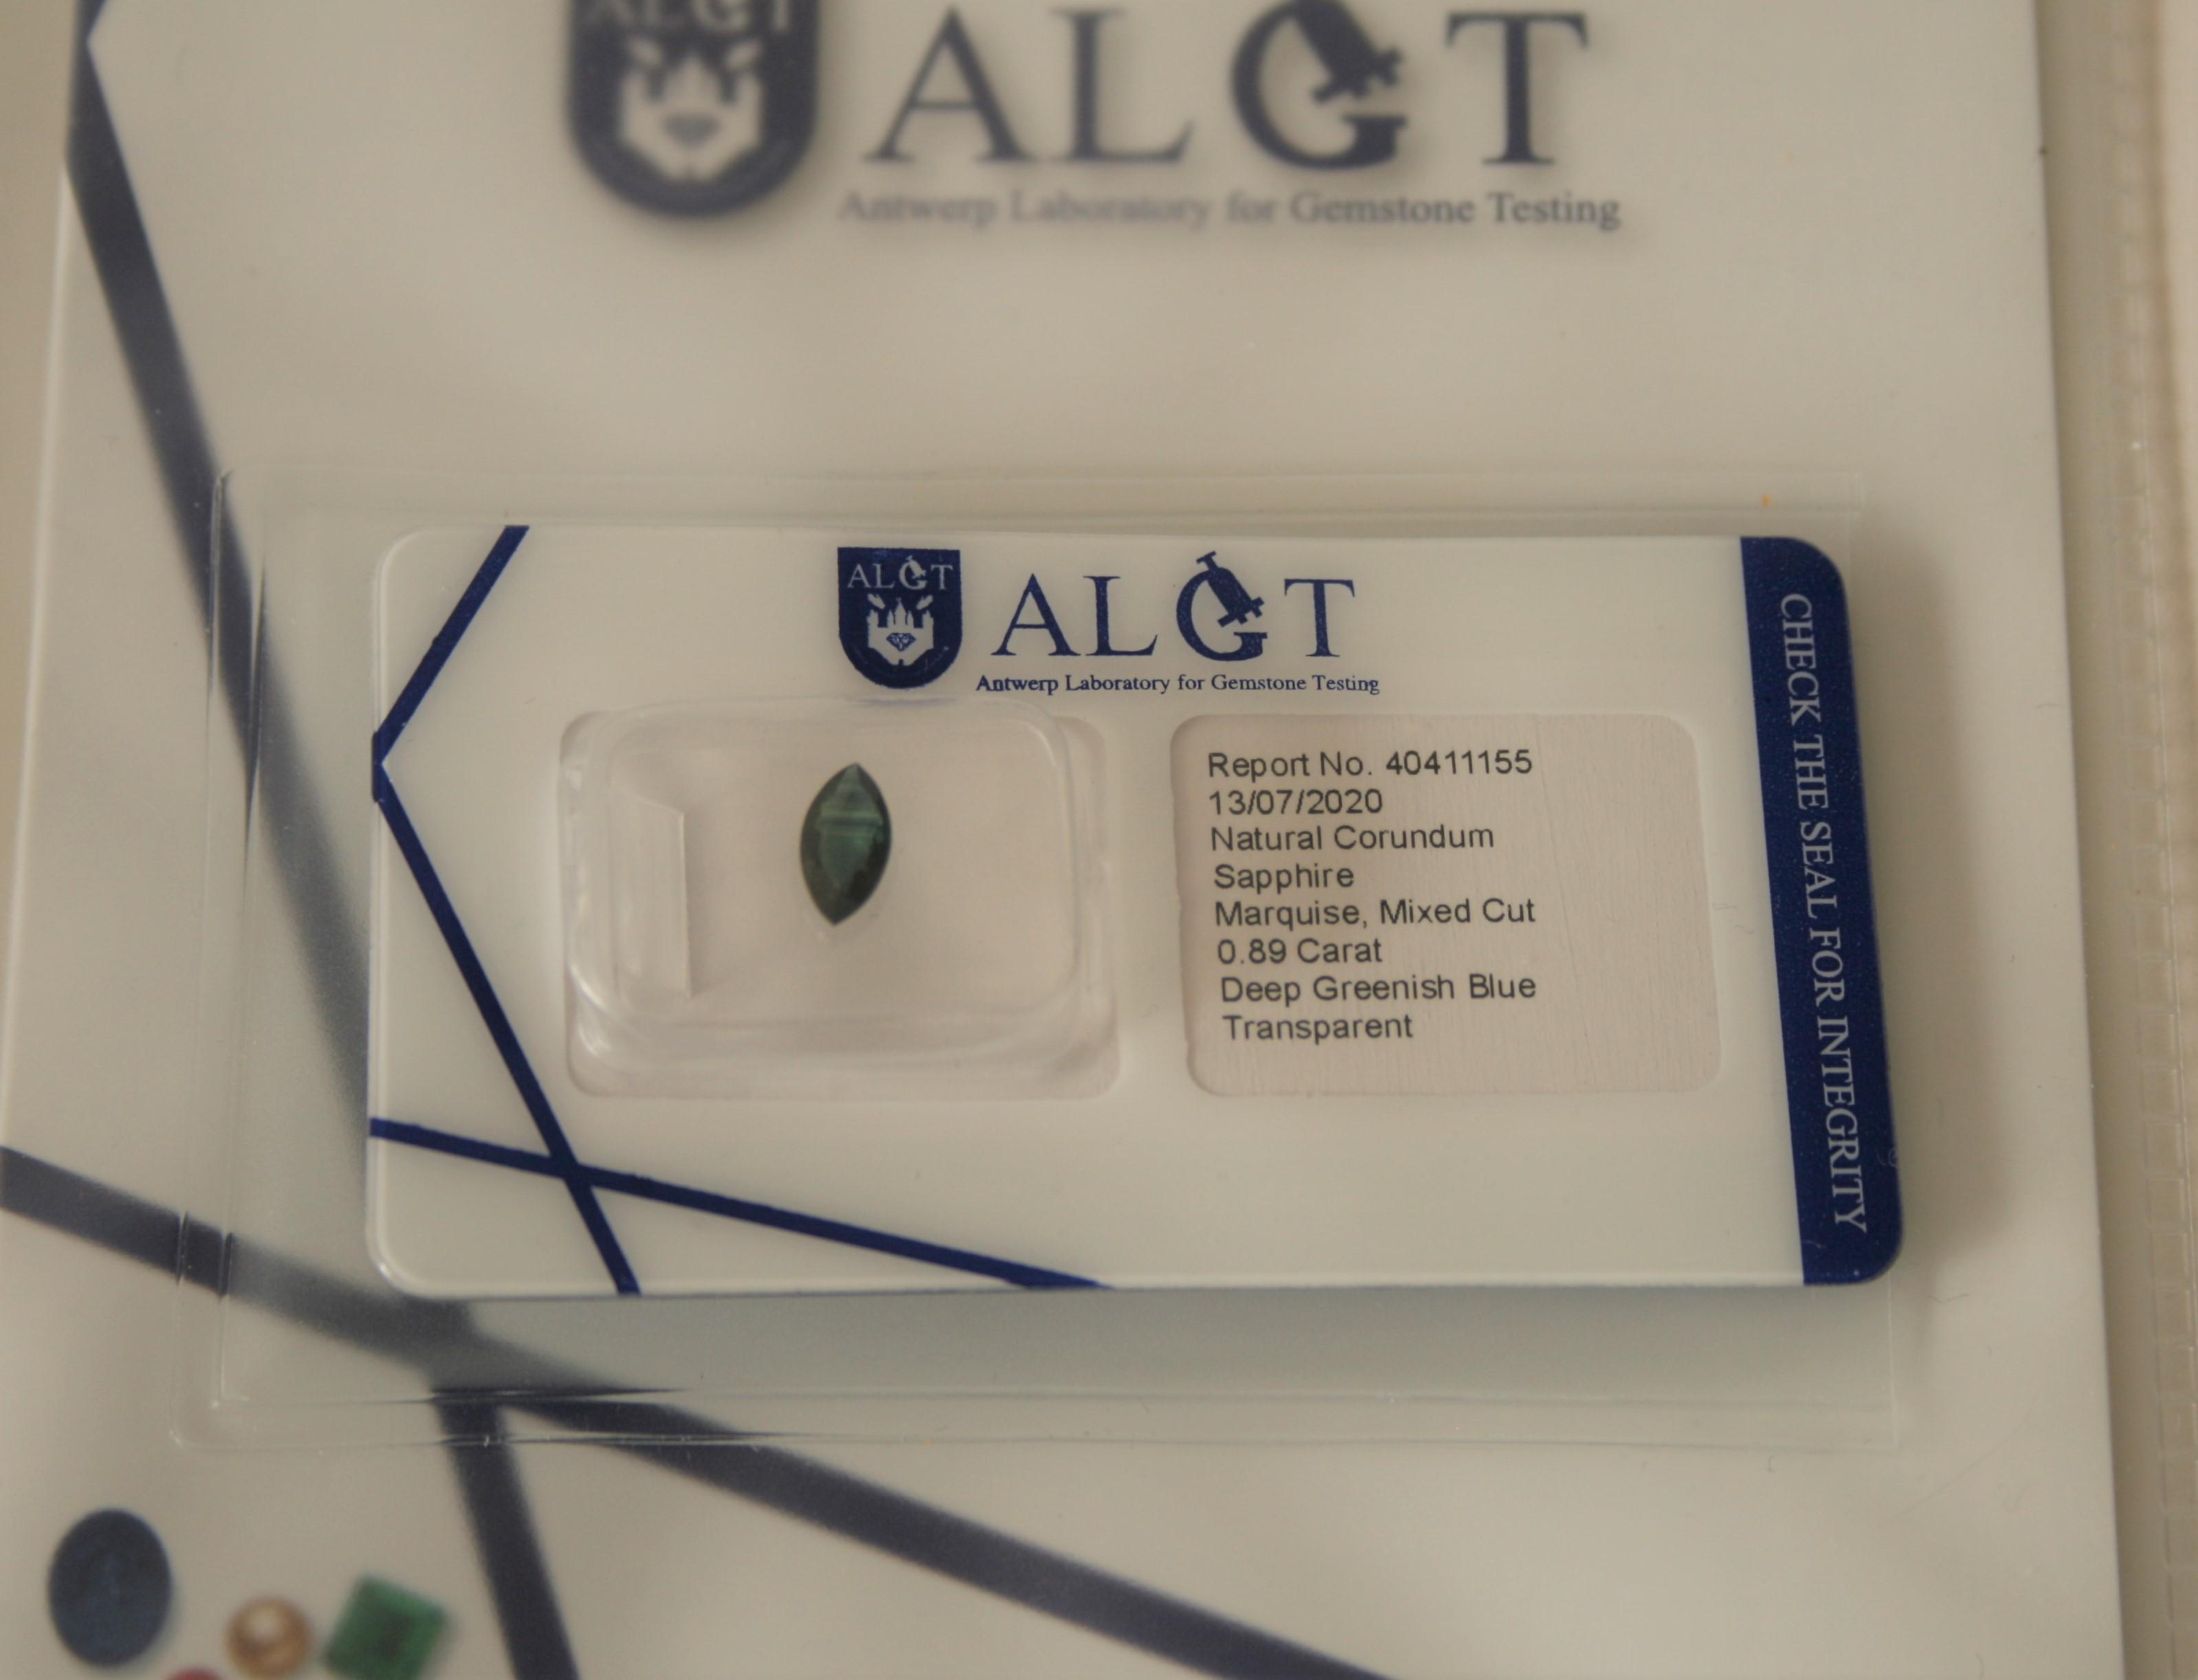 Saphir naturel, taille marquise, 0,89 carat, Deep Greenish Blue, Transparent, [...]